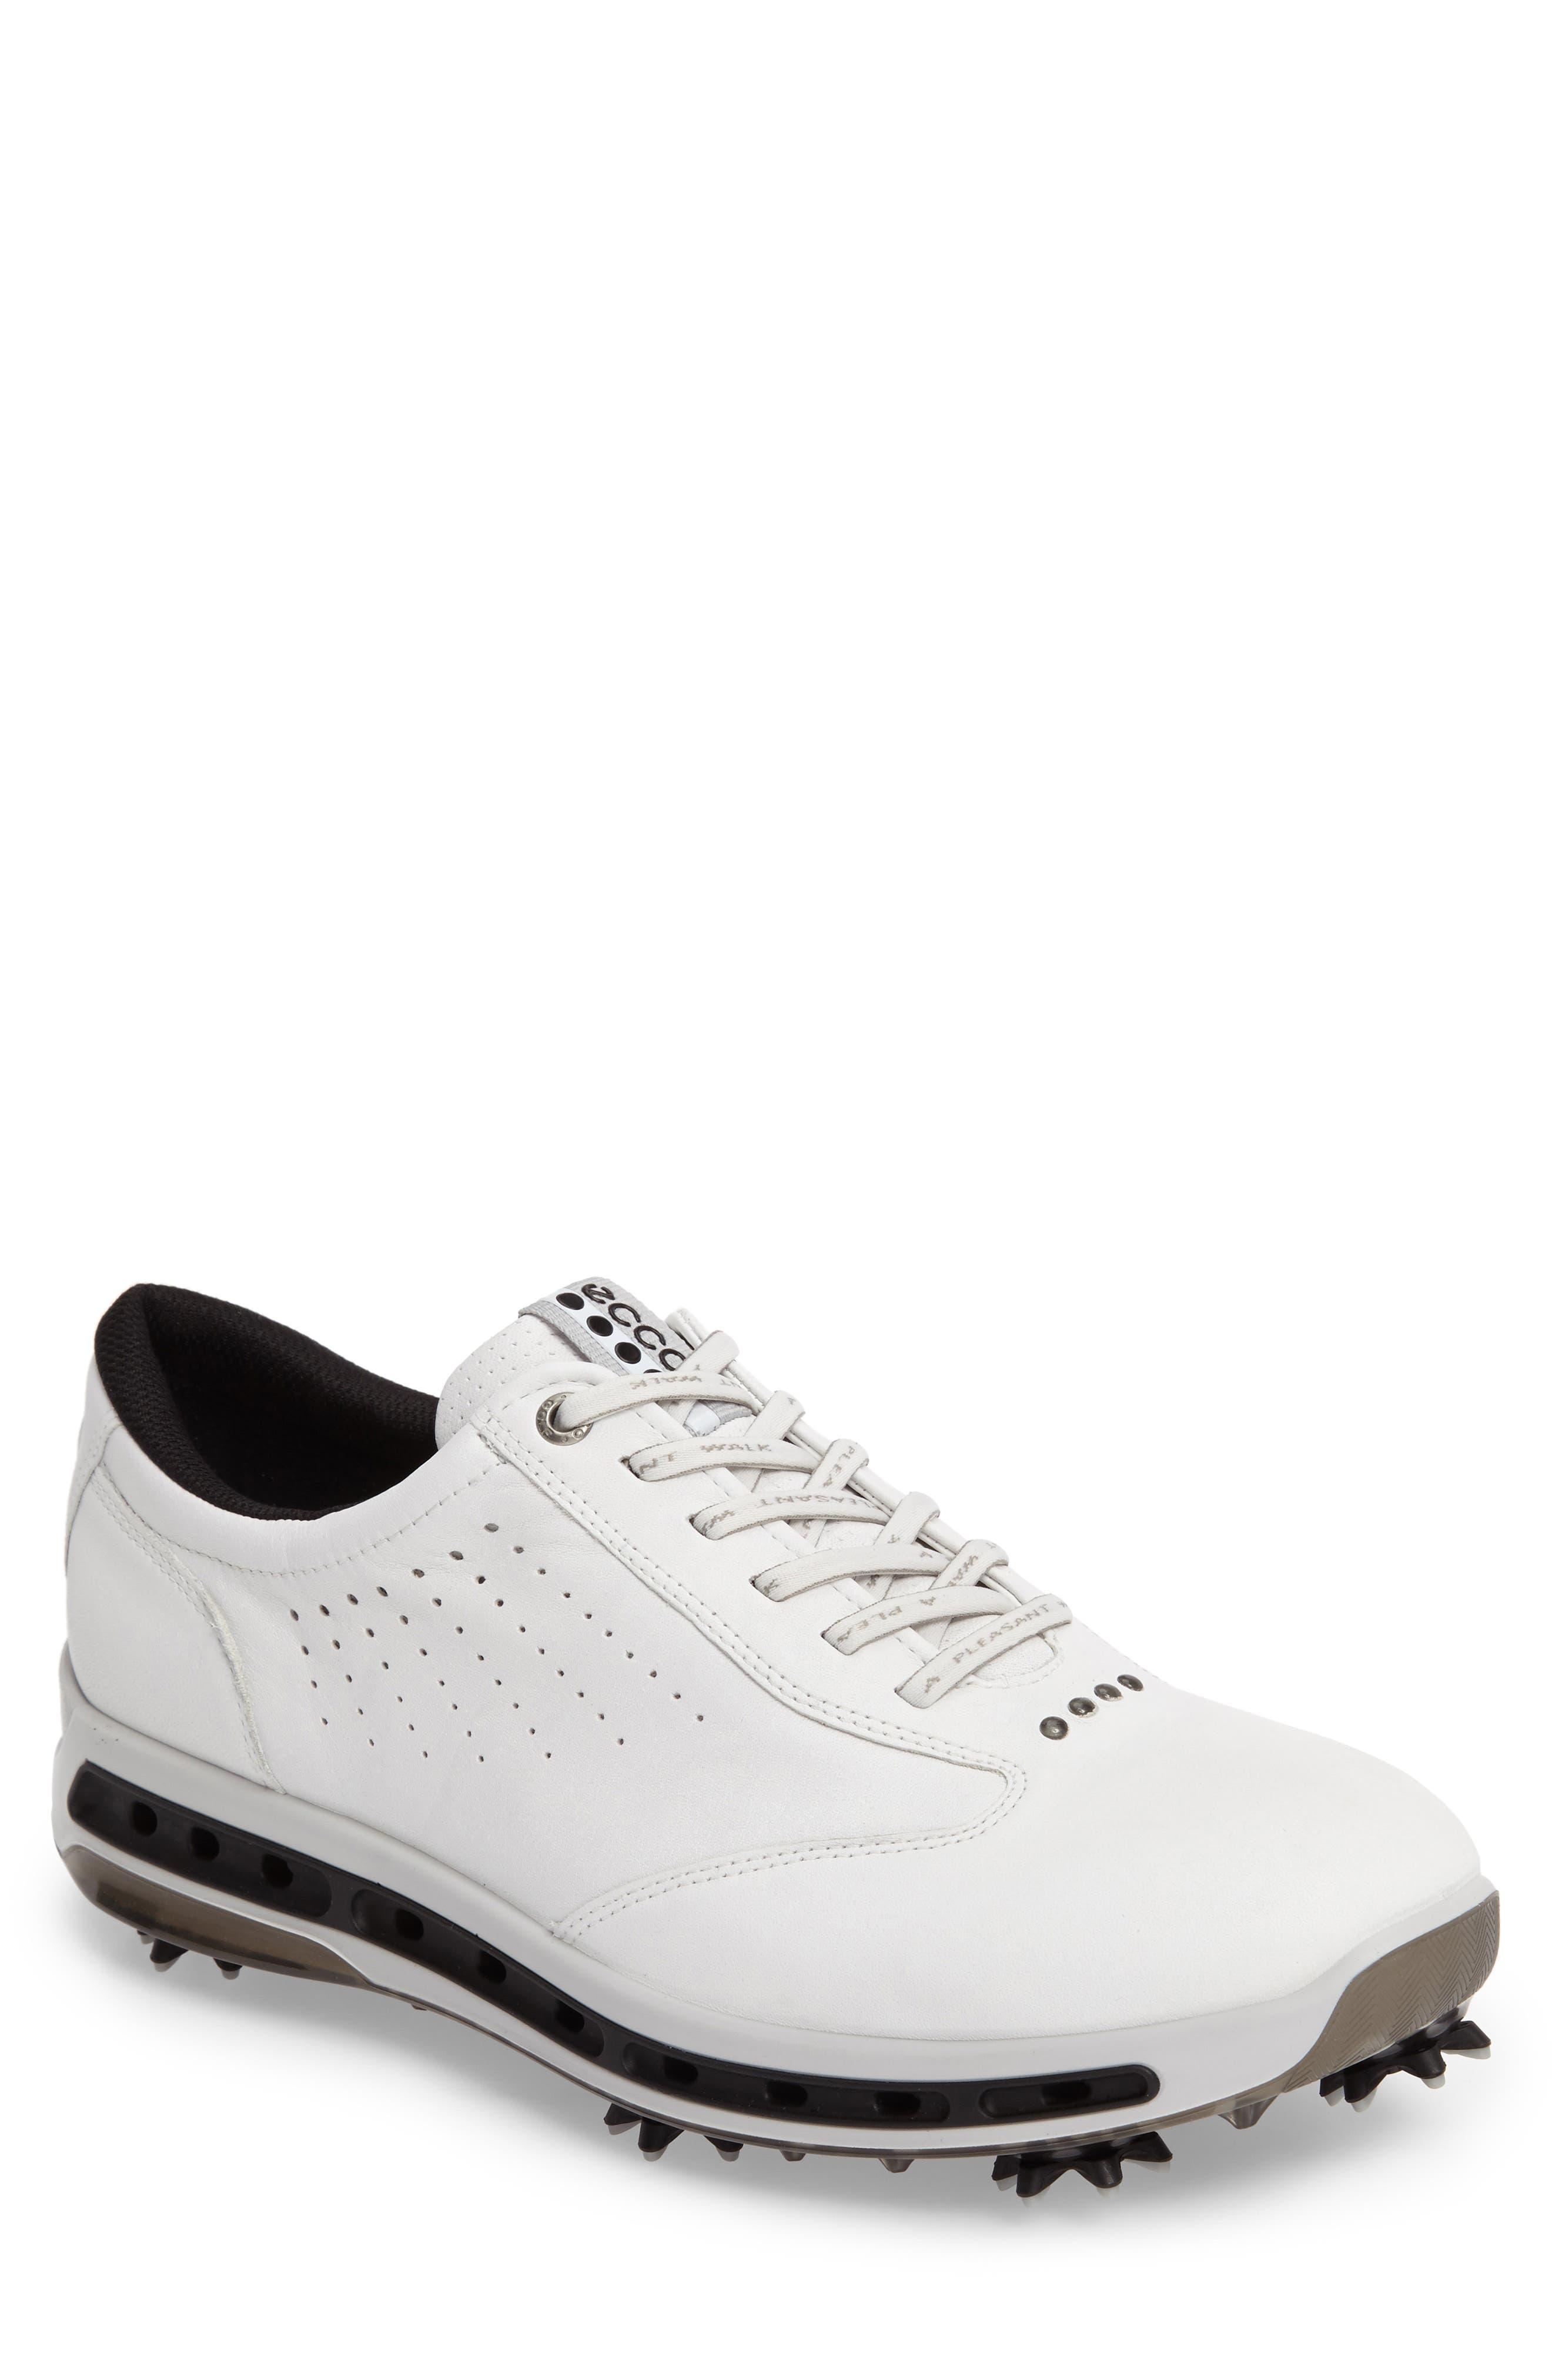 Cool GTX Golf Shoe,                             Main thumbnail 1, color,                             White/ Black